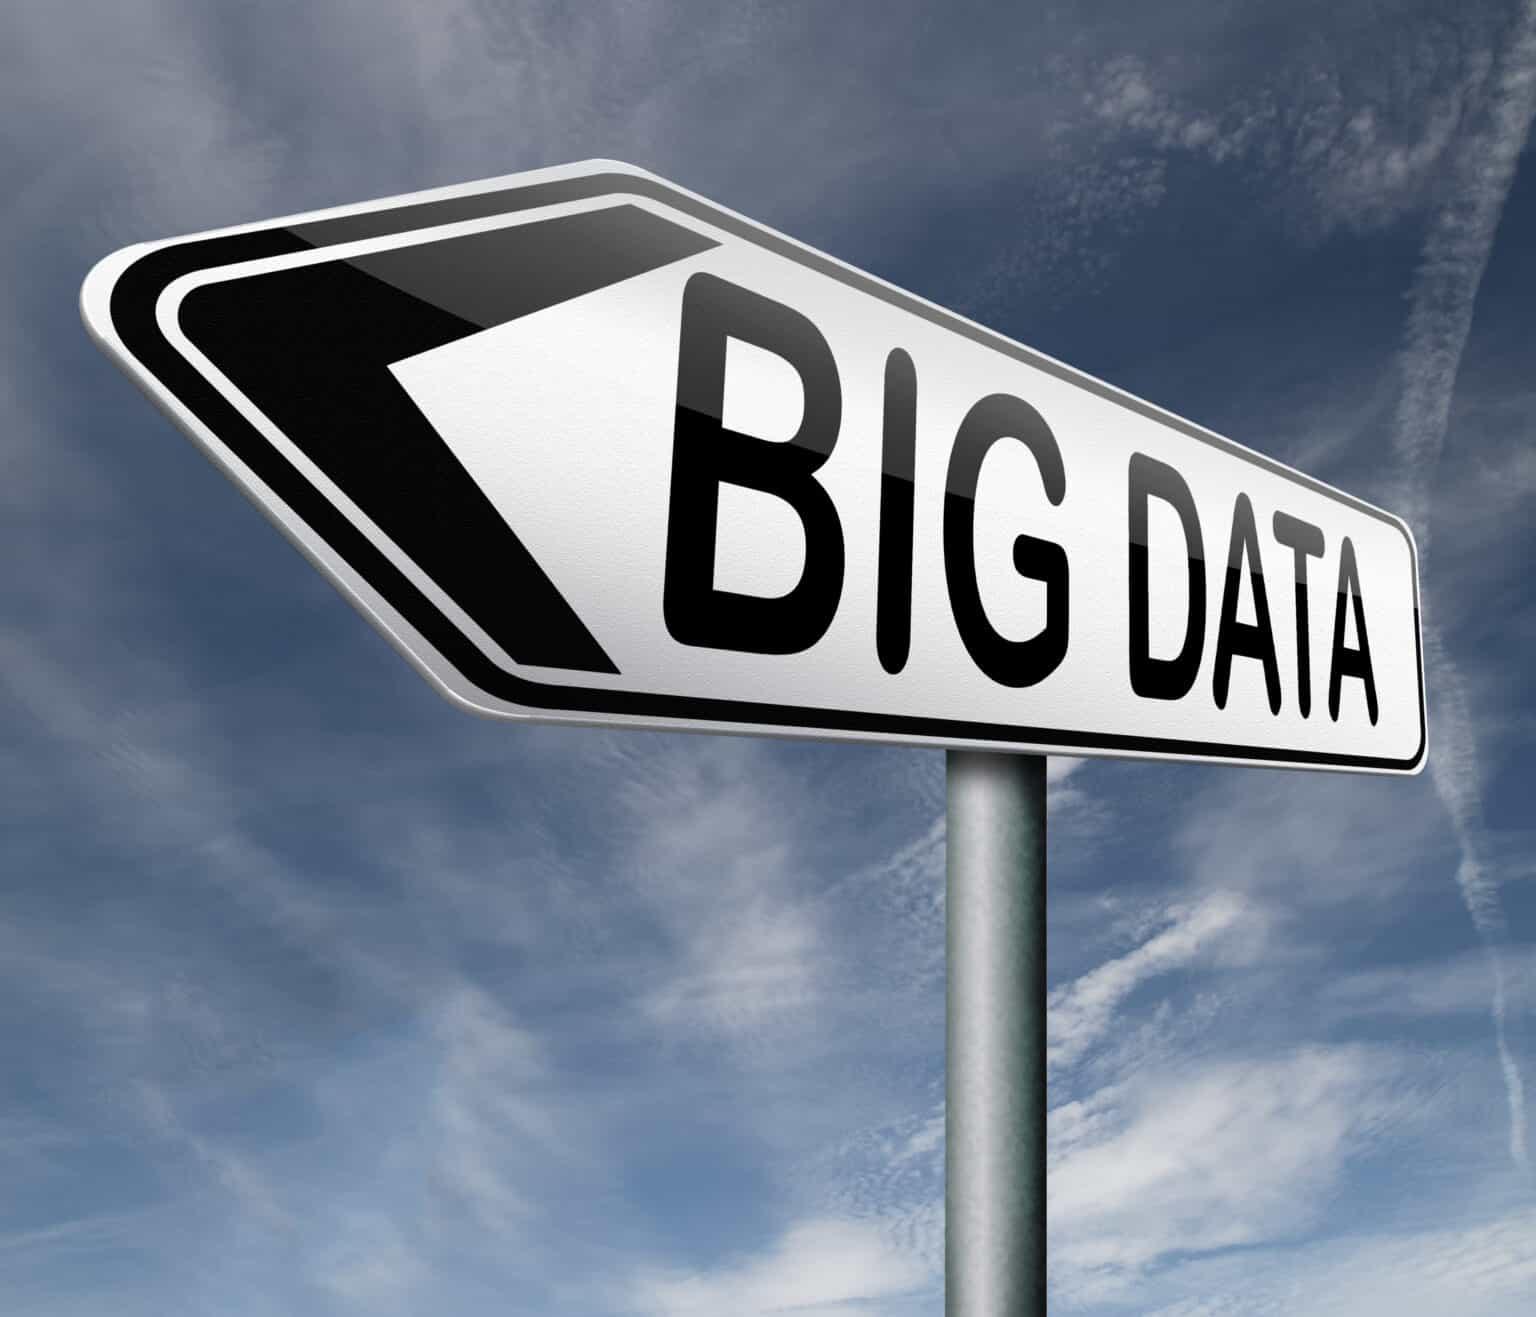 big data exabyte terrabyte or gigabyte in very large data set cloud computing storage